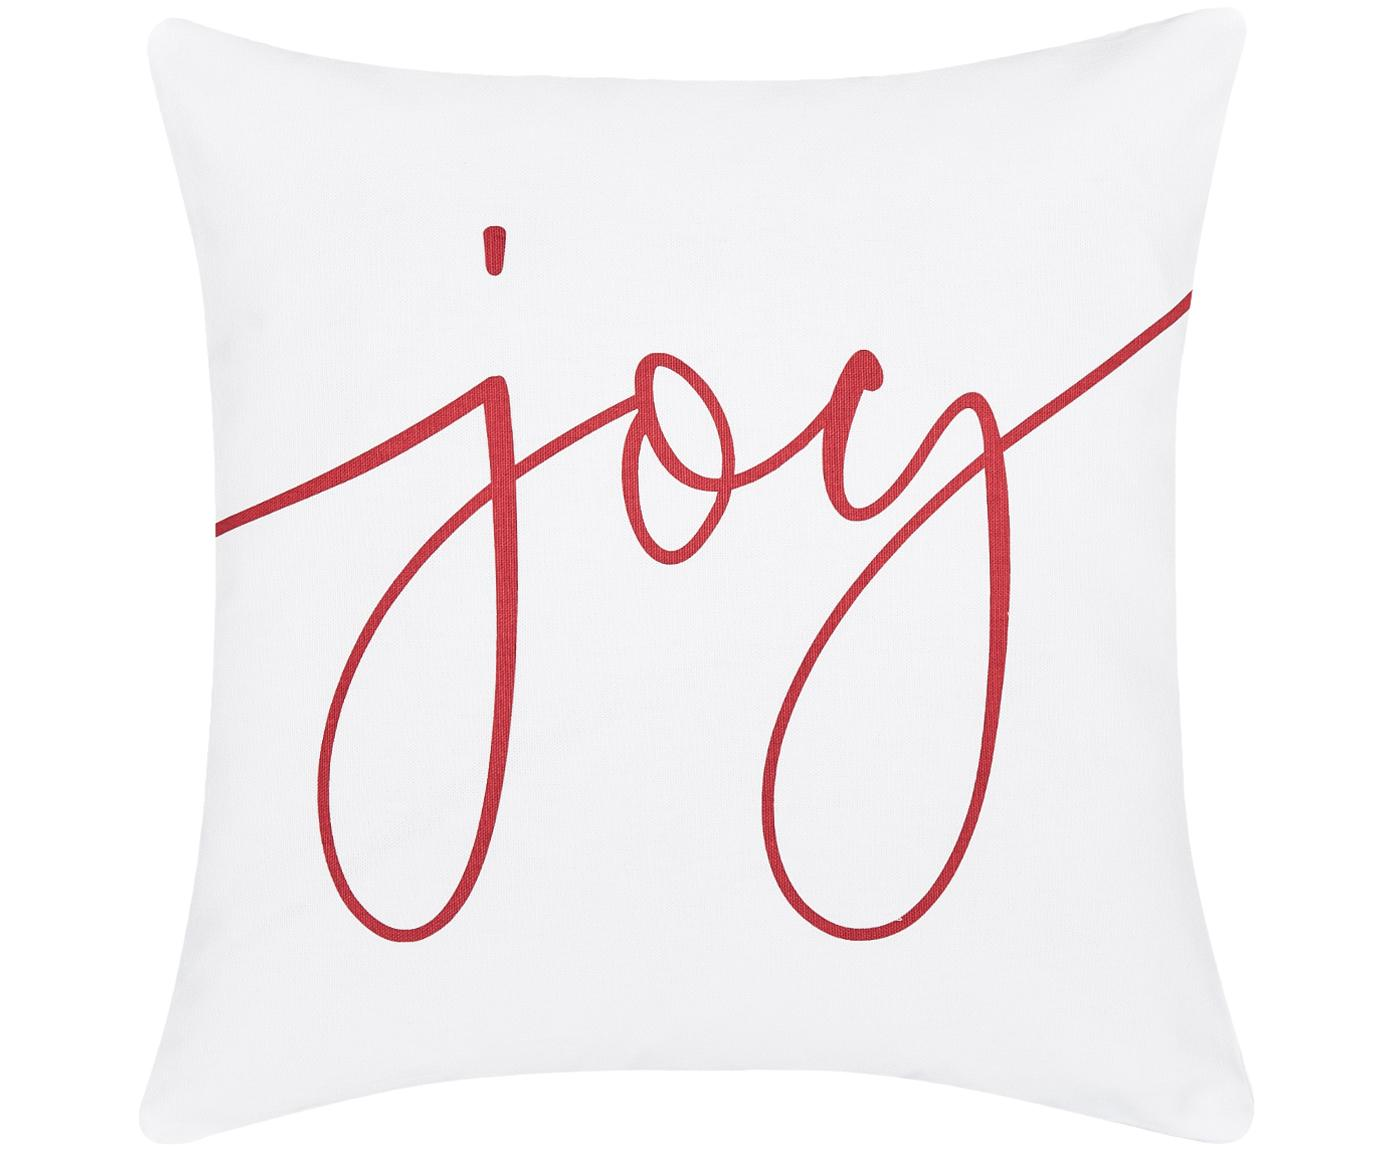 Kussenhoes Joy, 100% katoen, Wit, rood, 40 x 40 cm